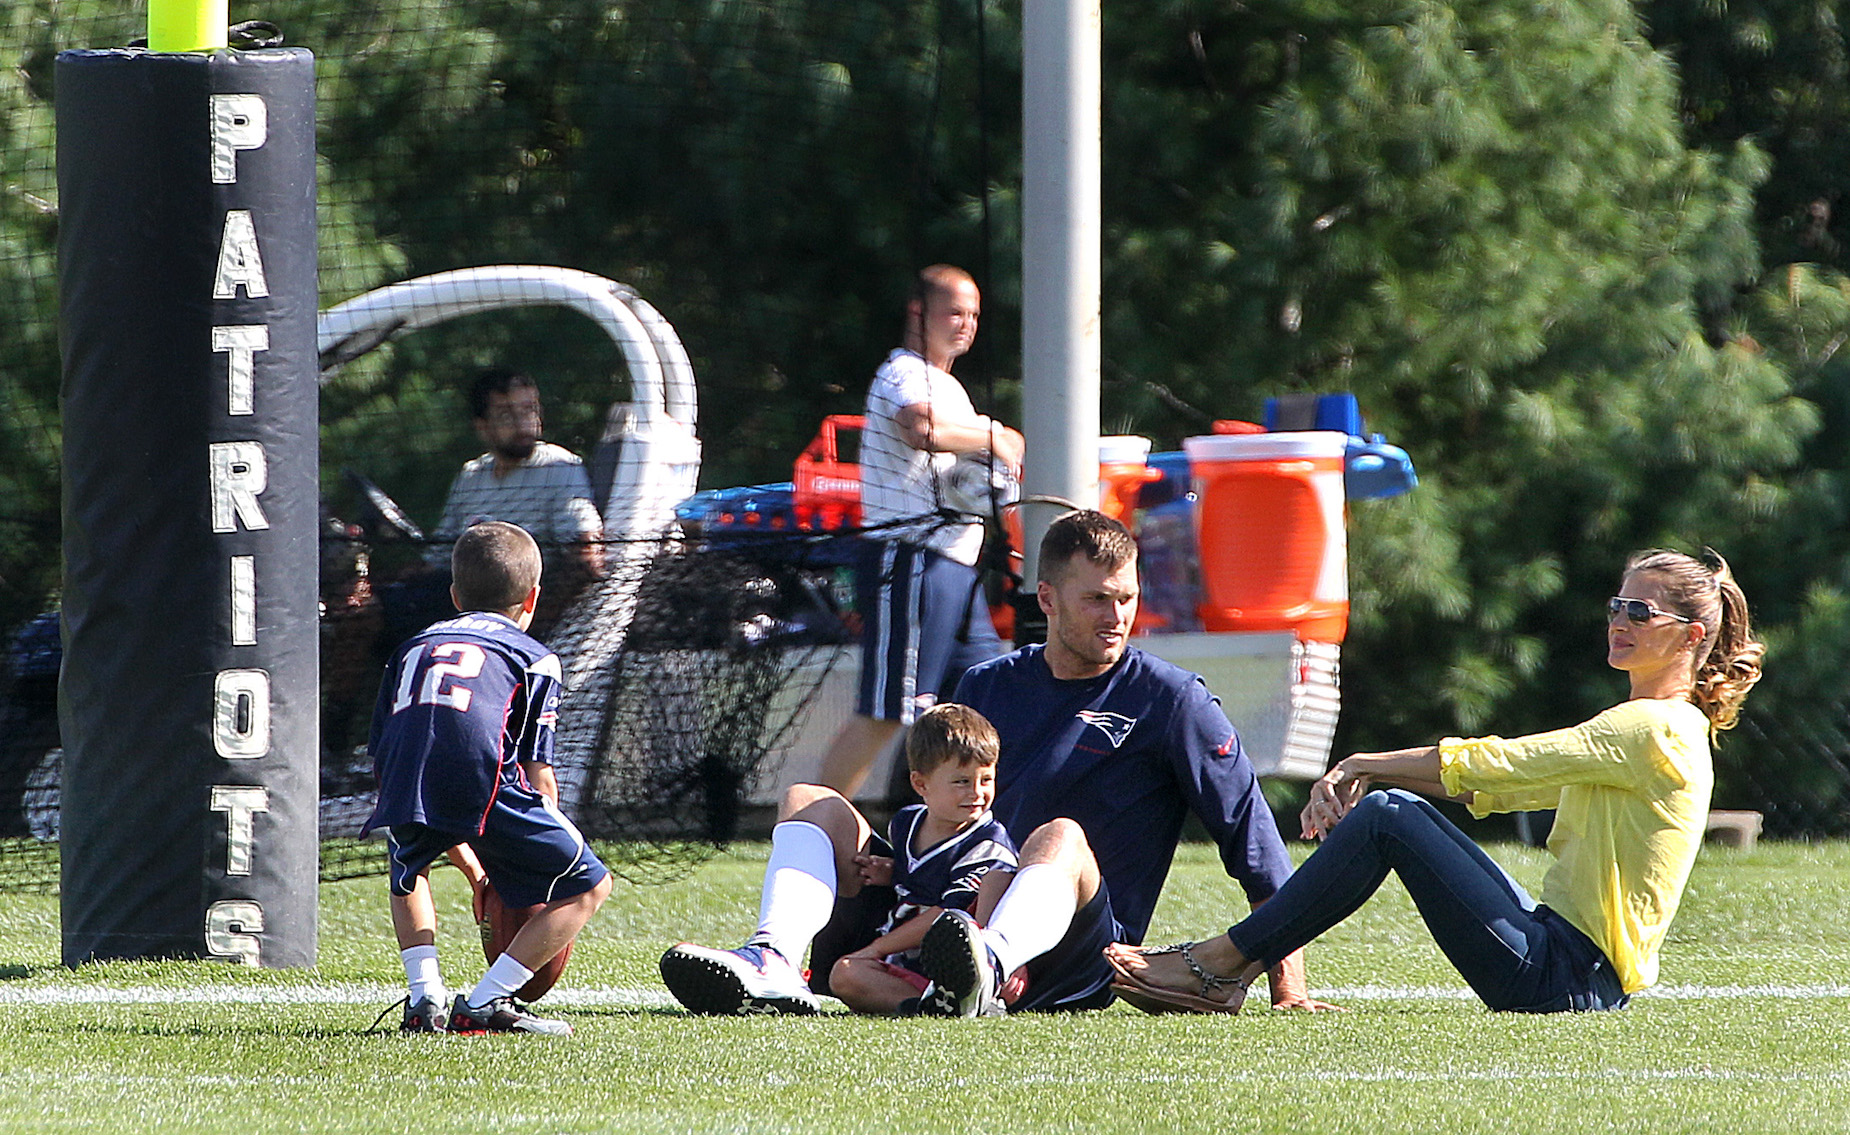 Will Tom Brady's sons play football like their old man?